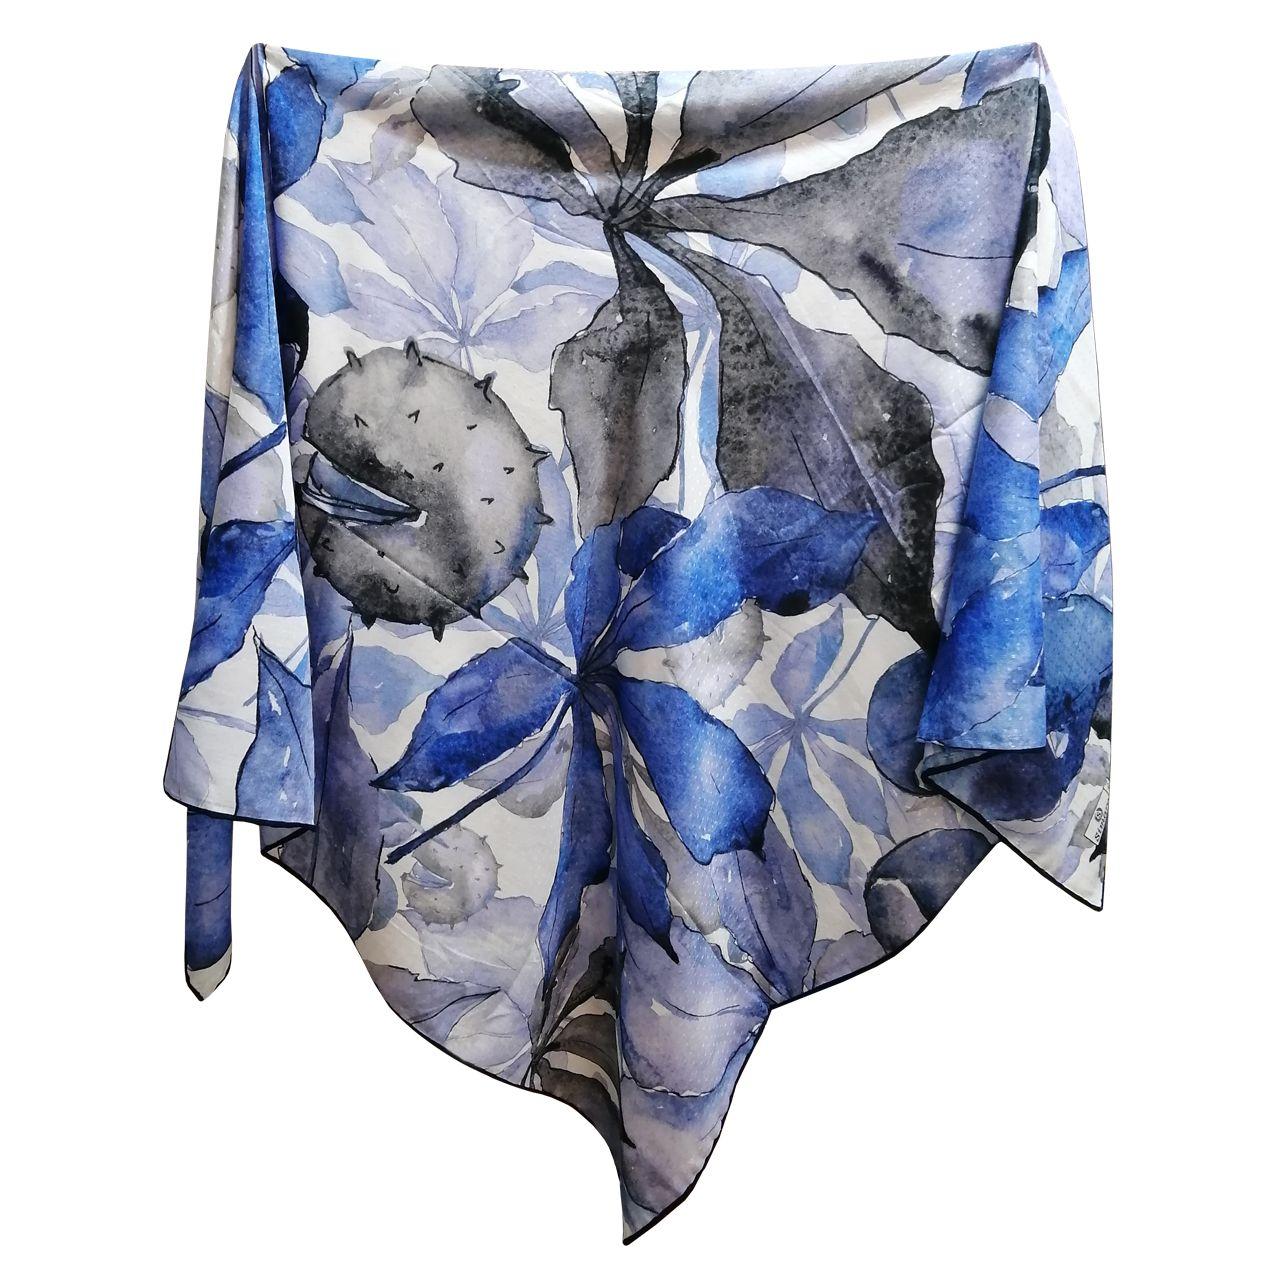 روسری زنانه کد 9902112 -  - 2